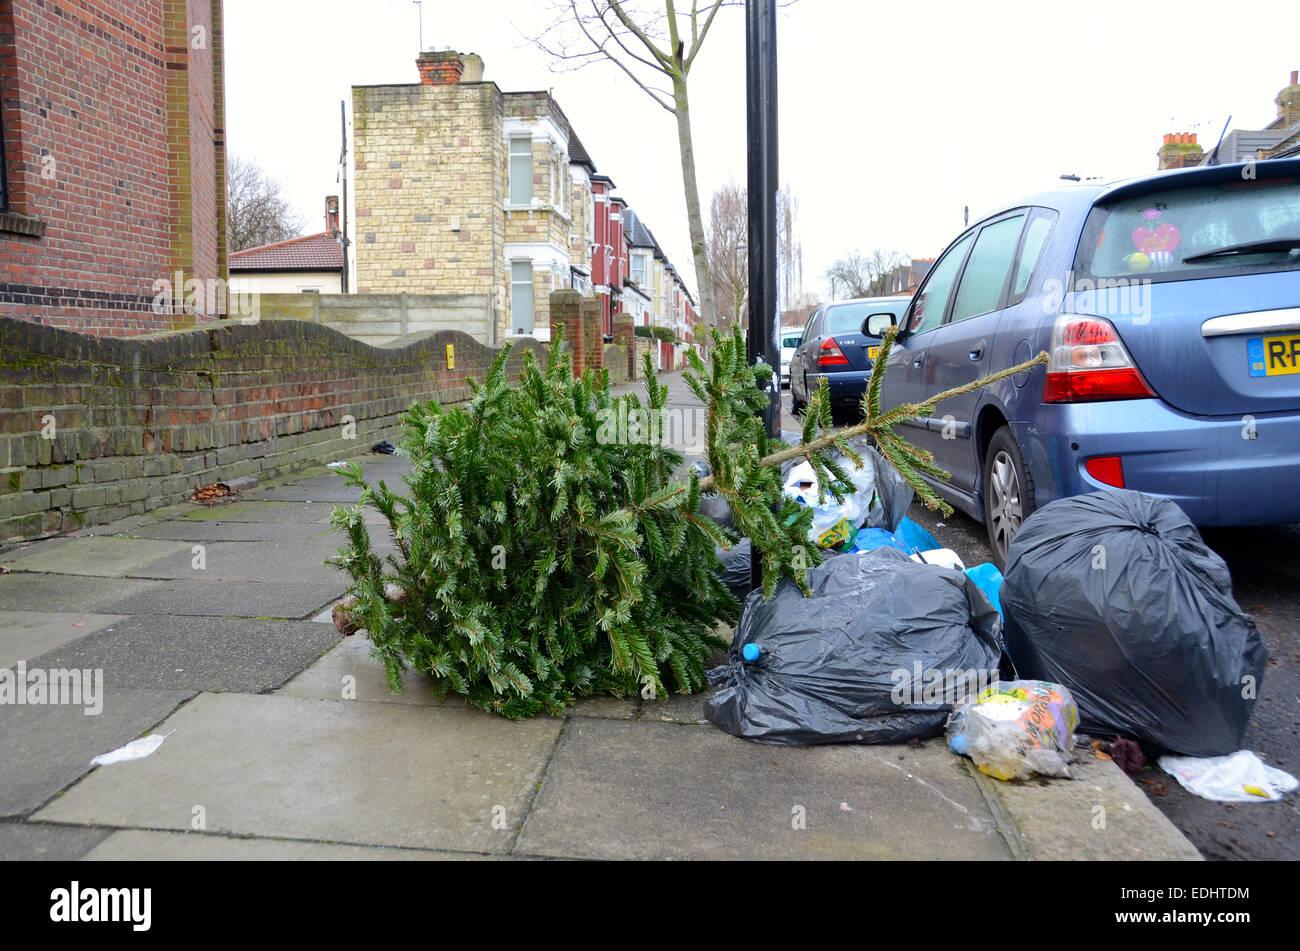 Rubbish In Street London Bin